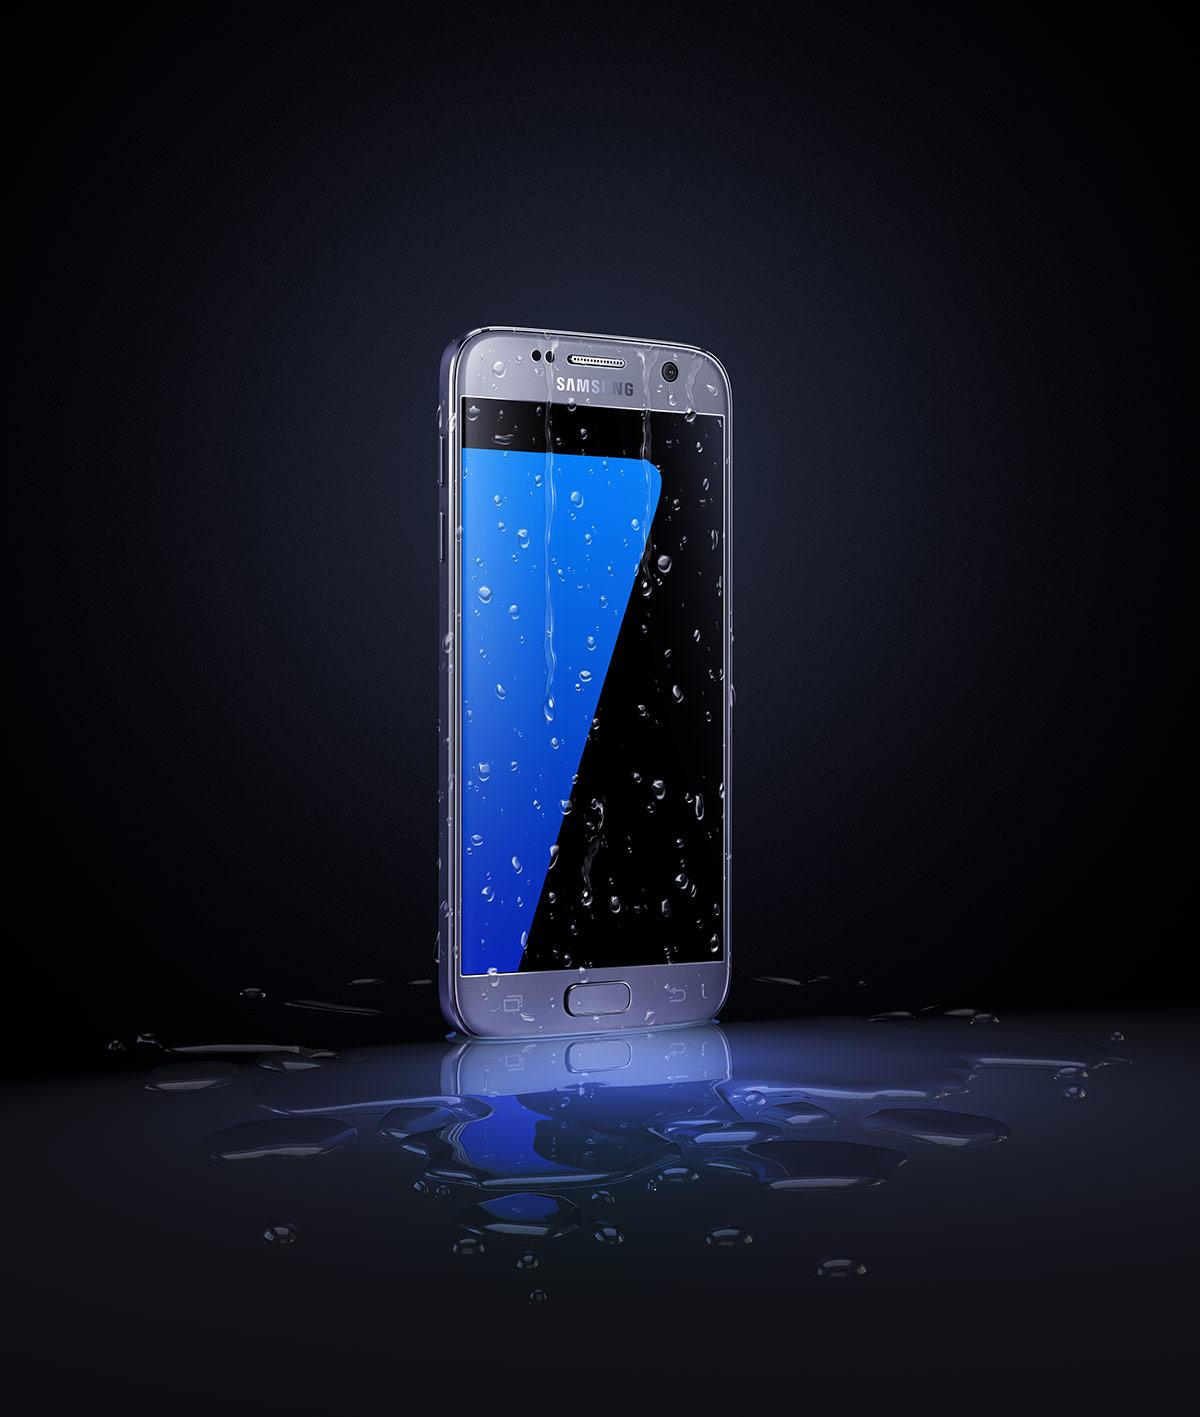 SamsungWetPhone_Night